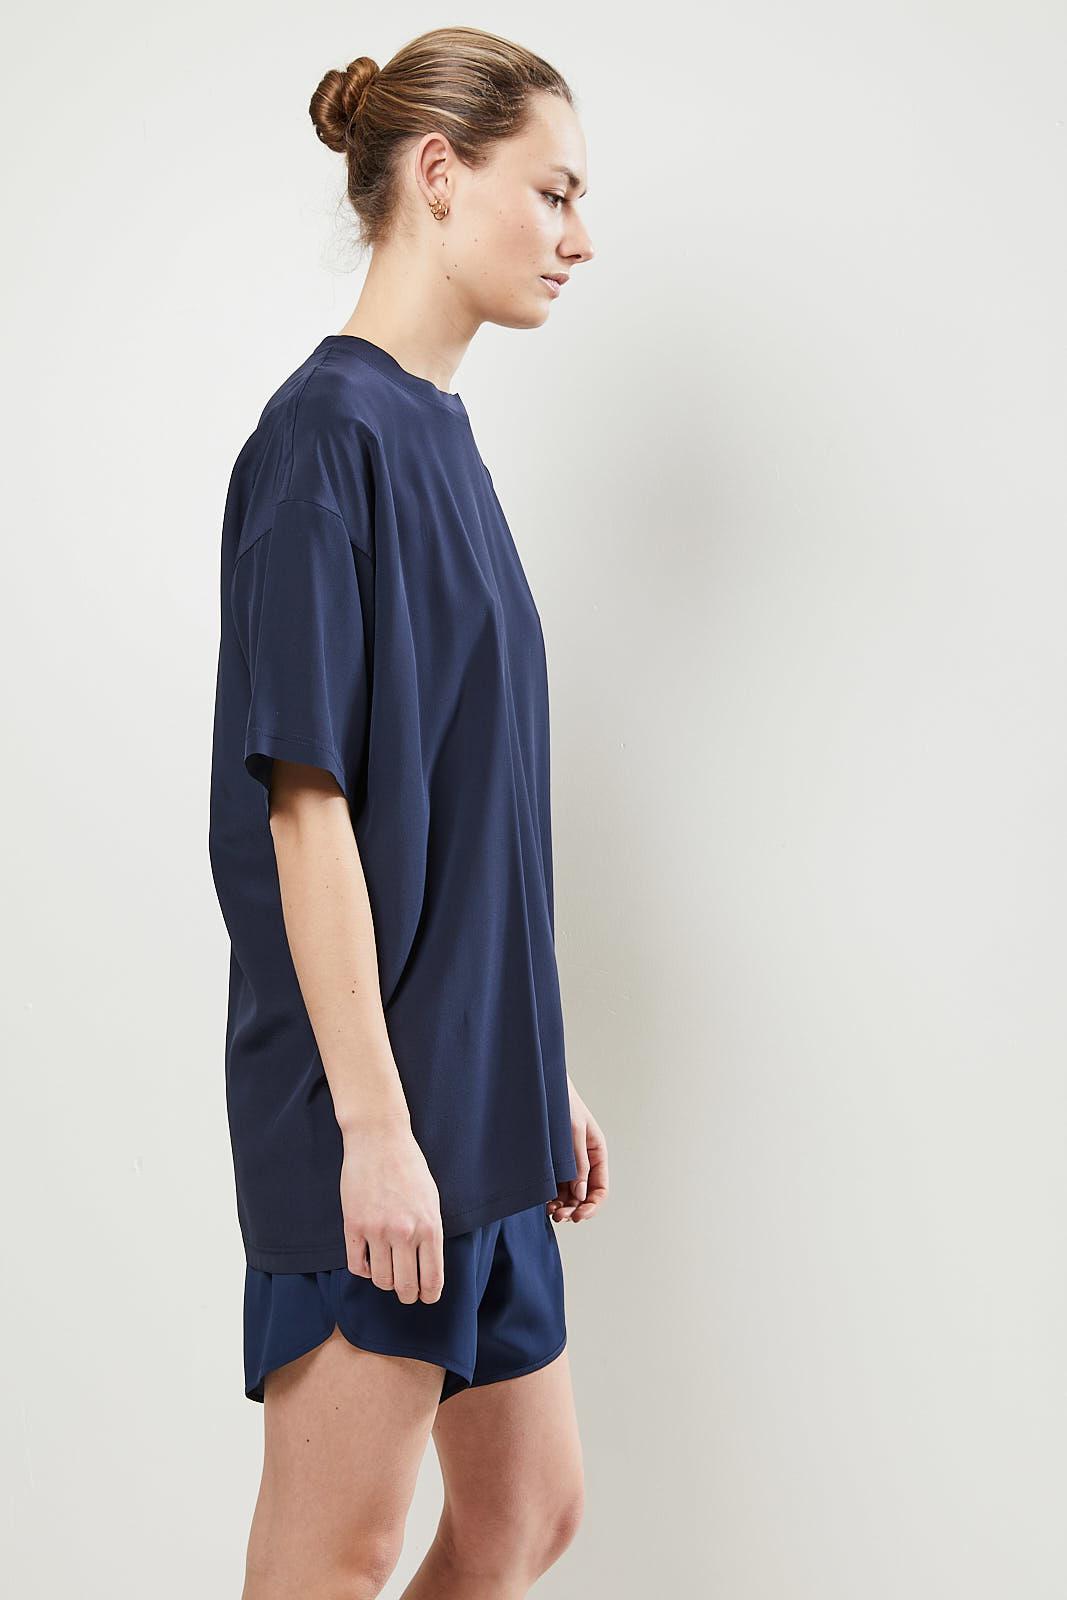 Monique van Heist - LOL mini shortsleeve silk t-shirt navy